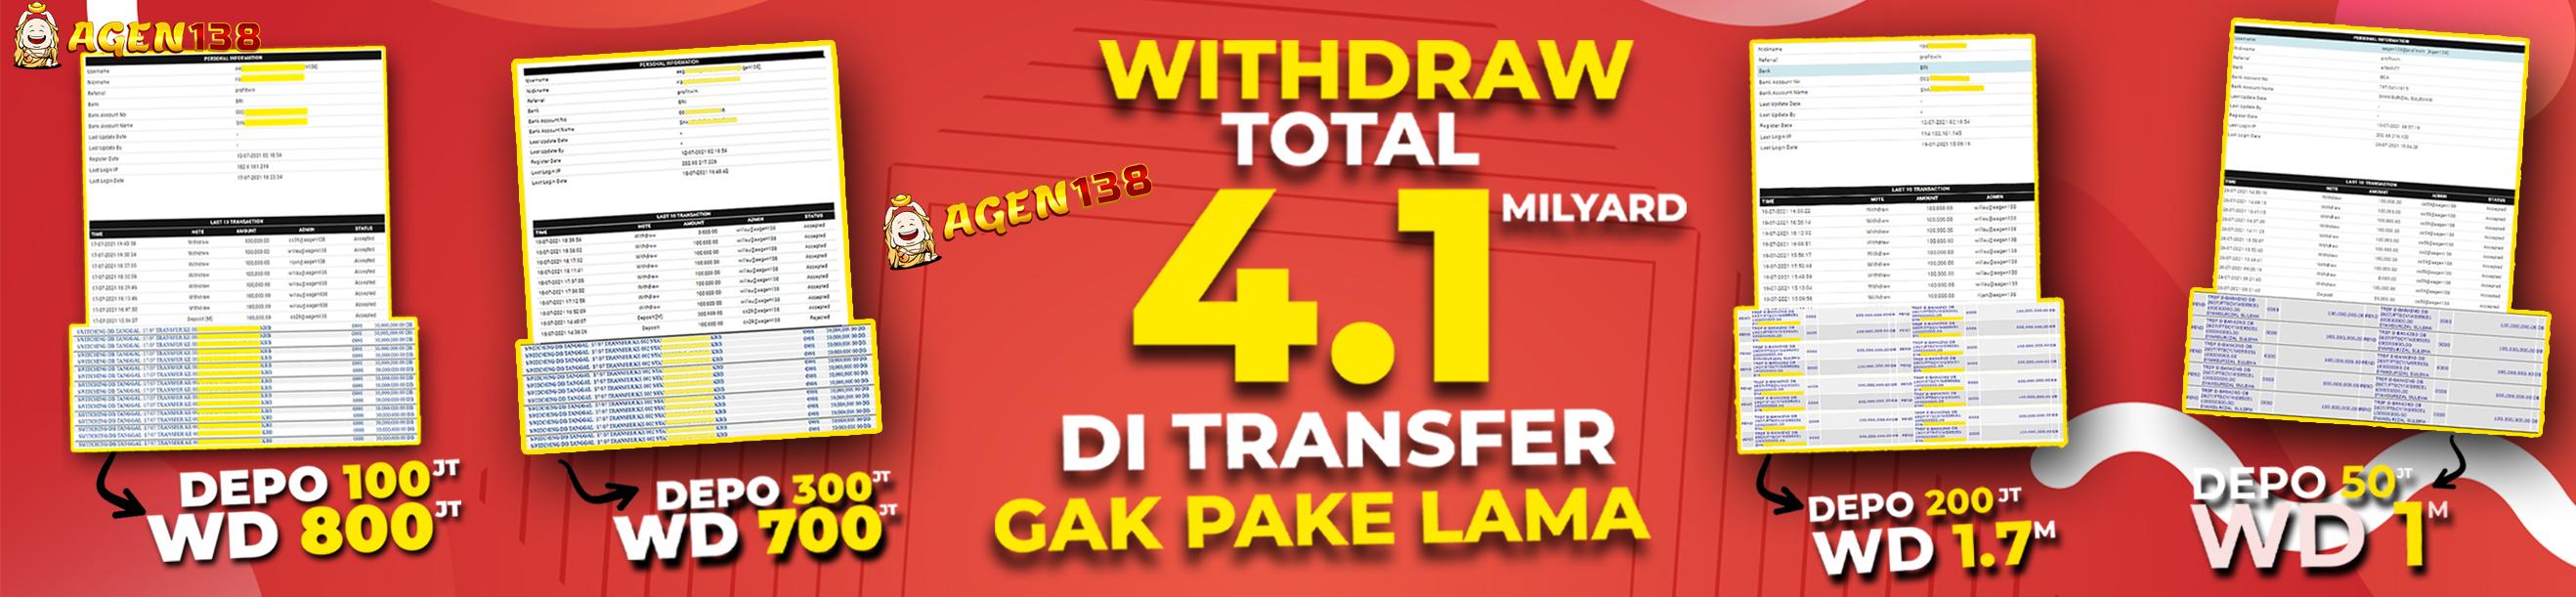 Withdraw 4 Miliar